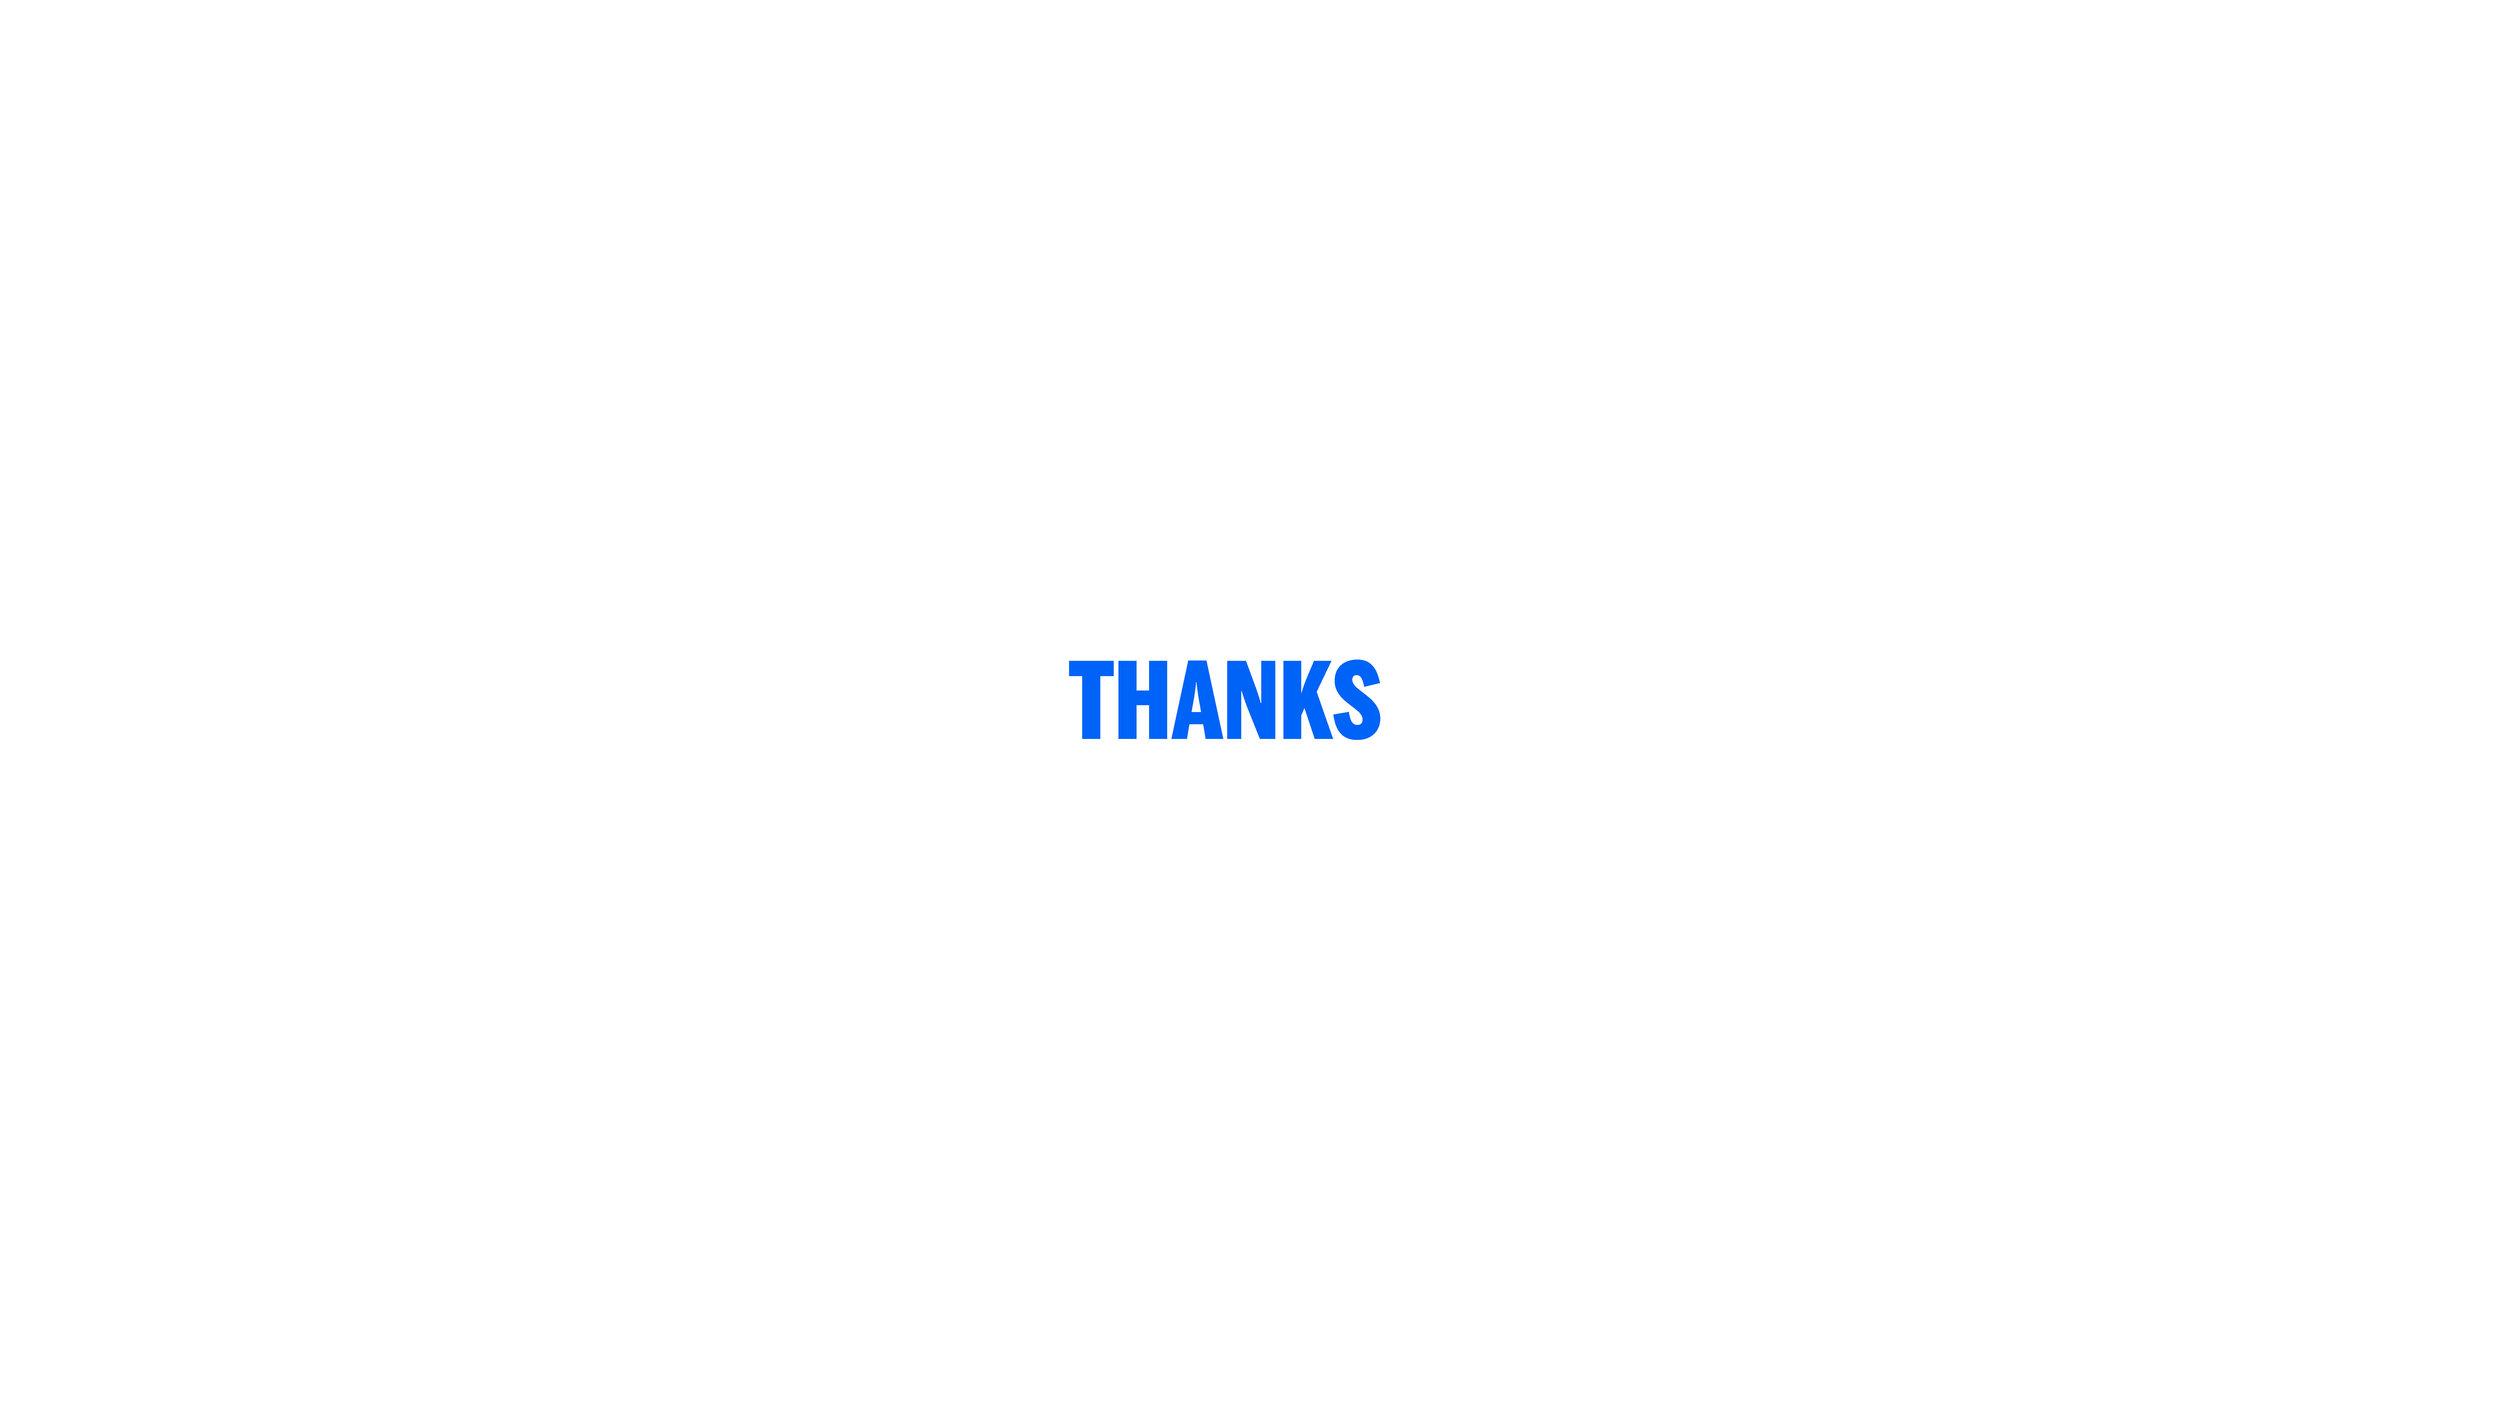 DeckFrame_Page_8.jpg